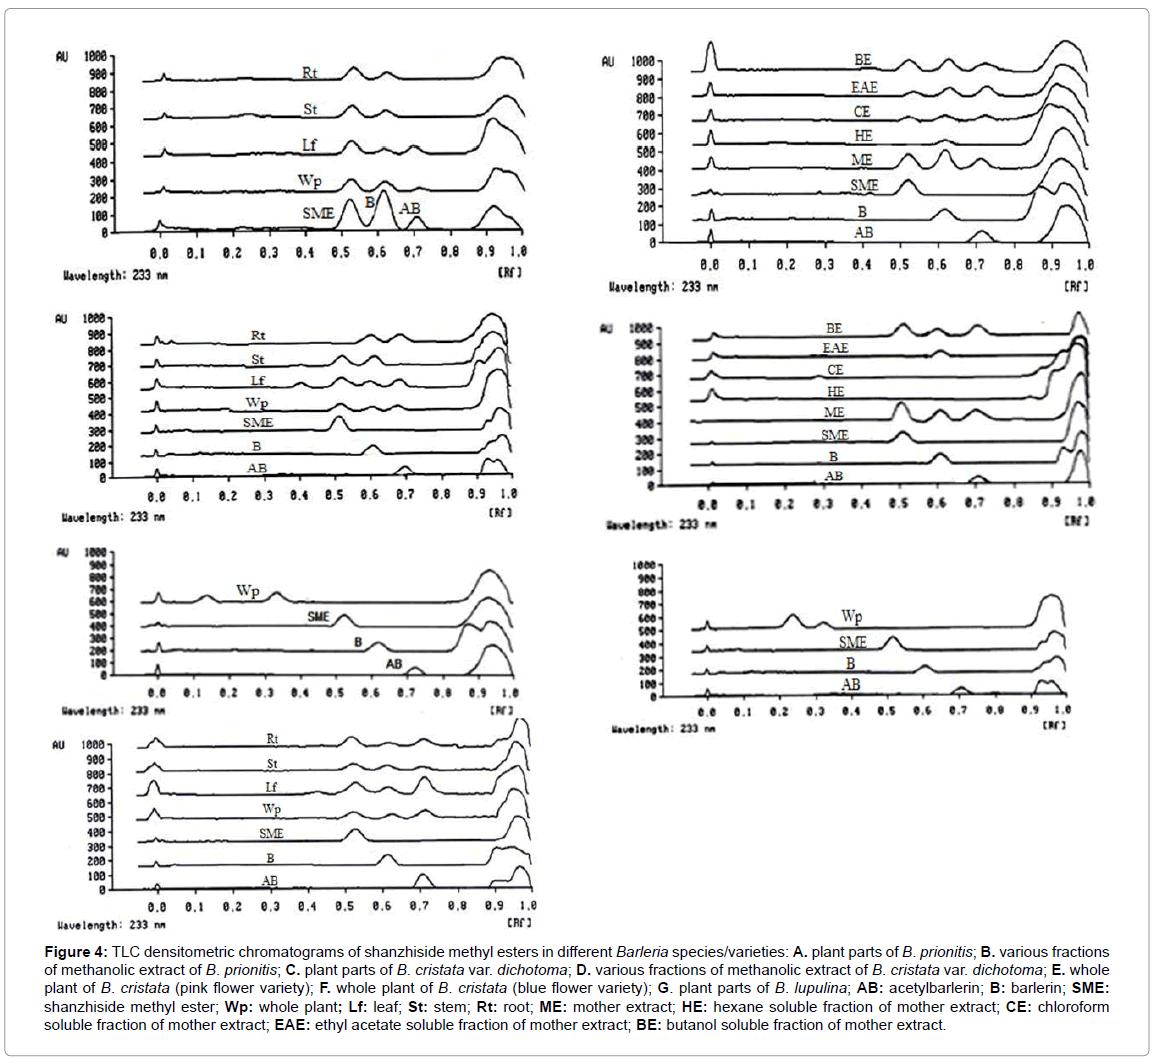 chromatography-separation-techniques-densitometric-chromatograms-shanzhiside